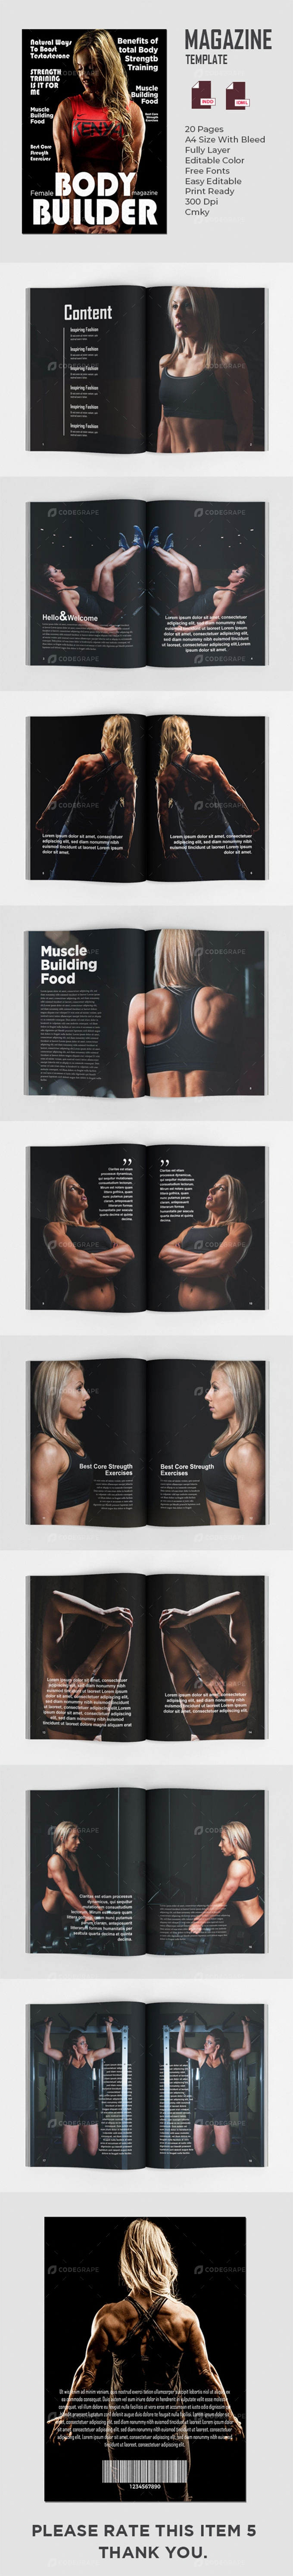 Female Bodybuilder Magazines